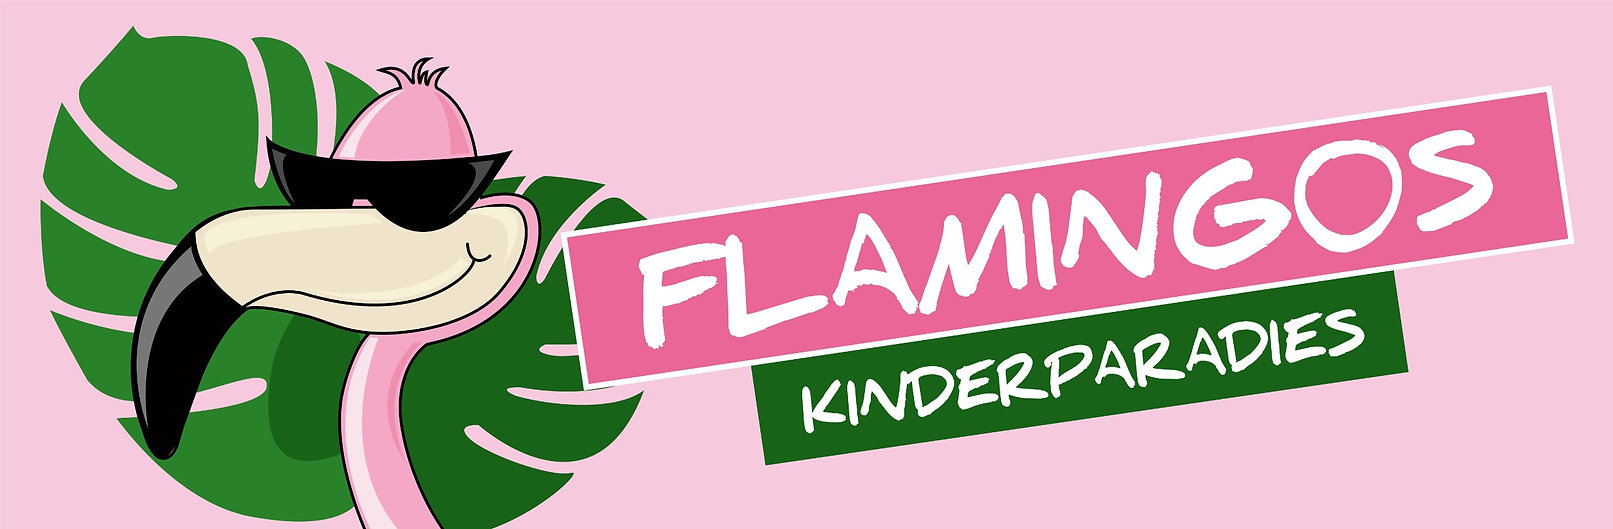 Flamingo_Website_edited_edited.jpg